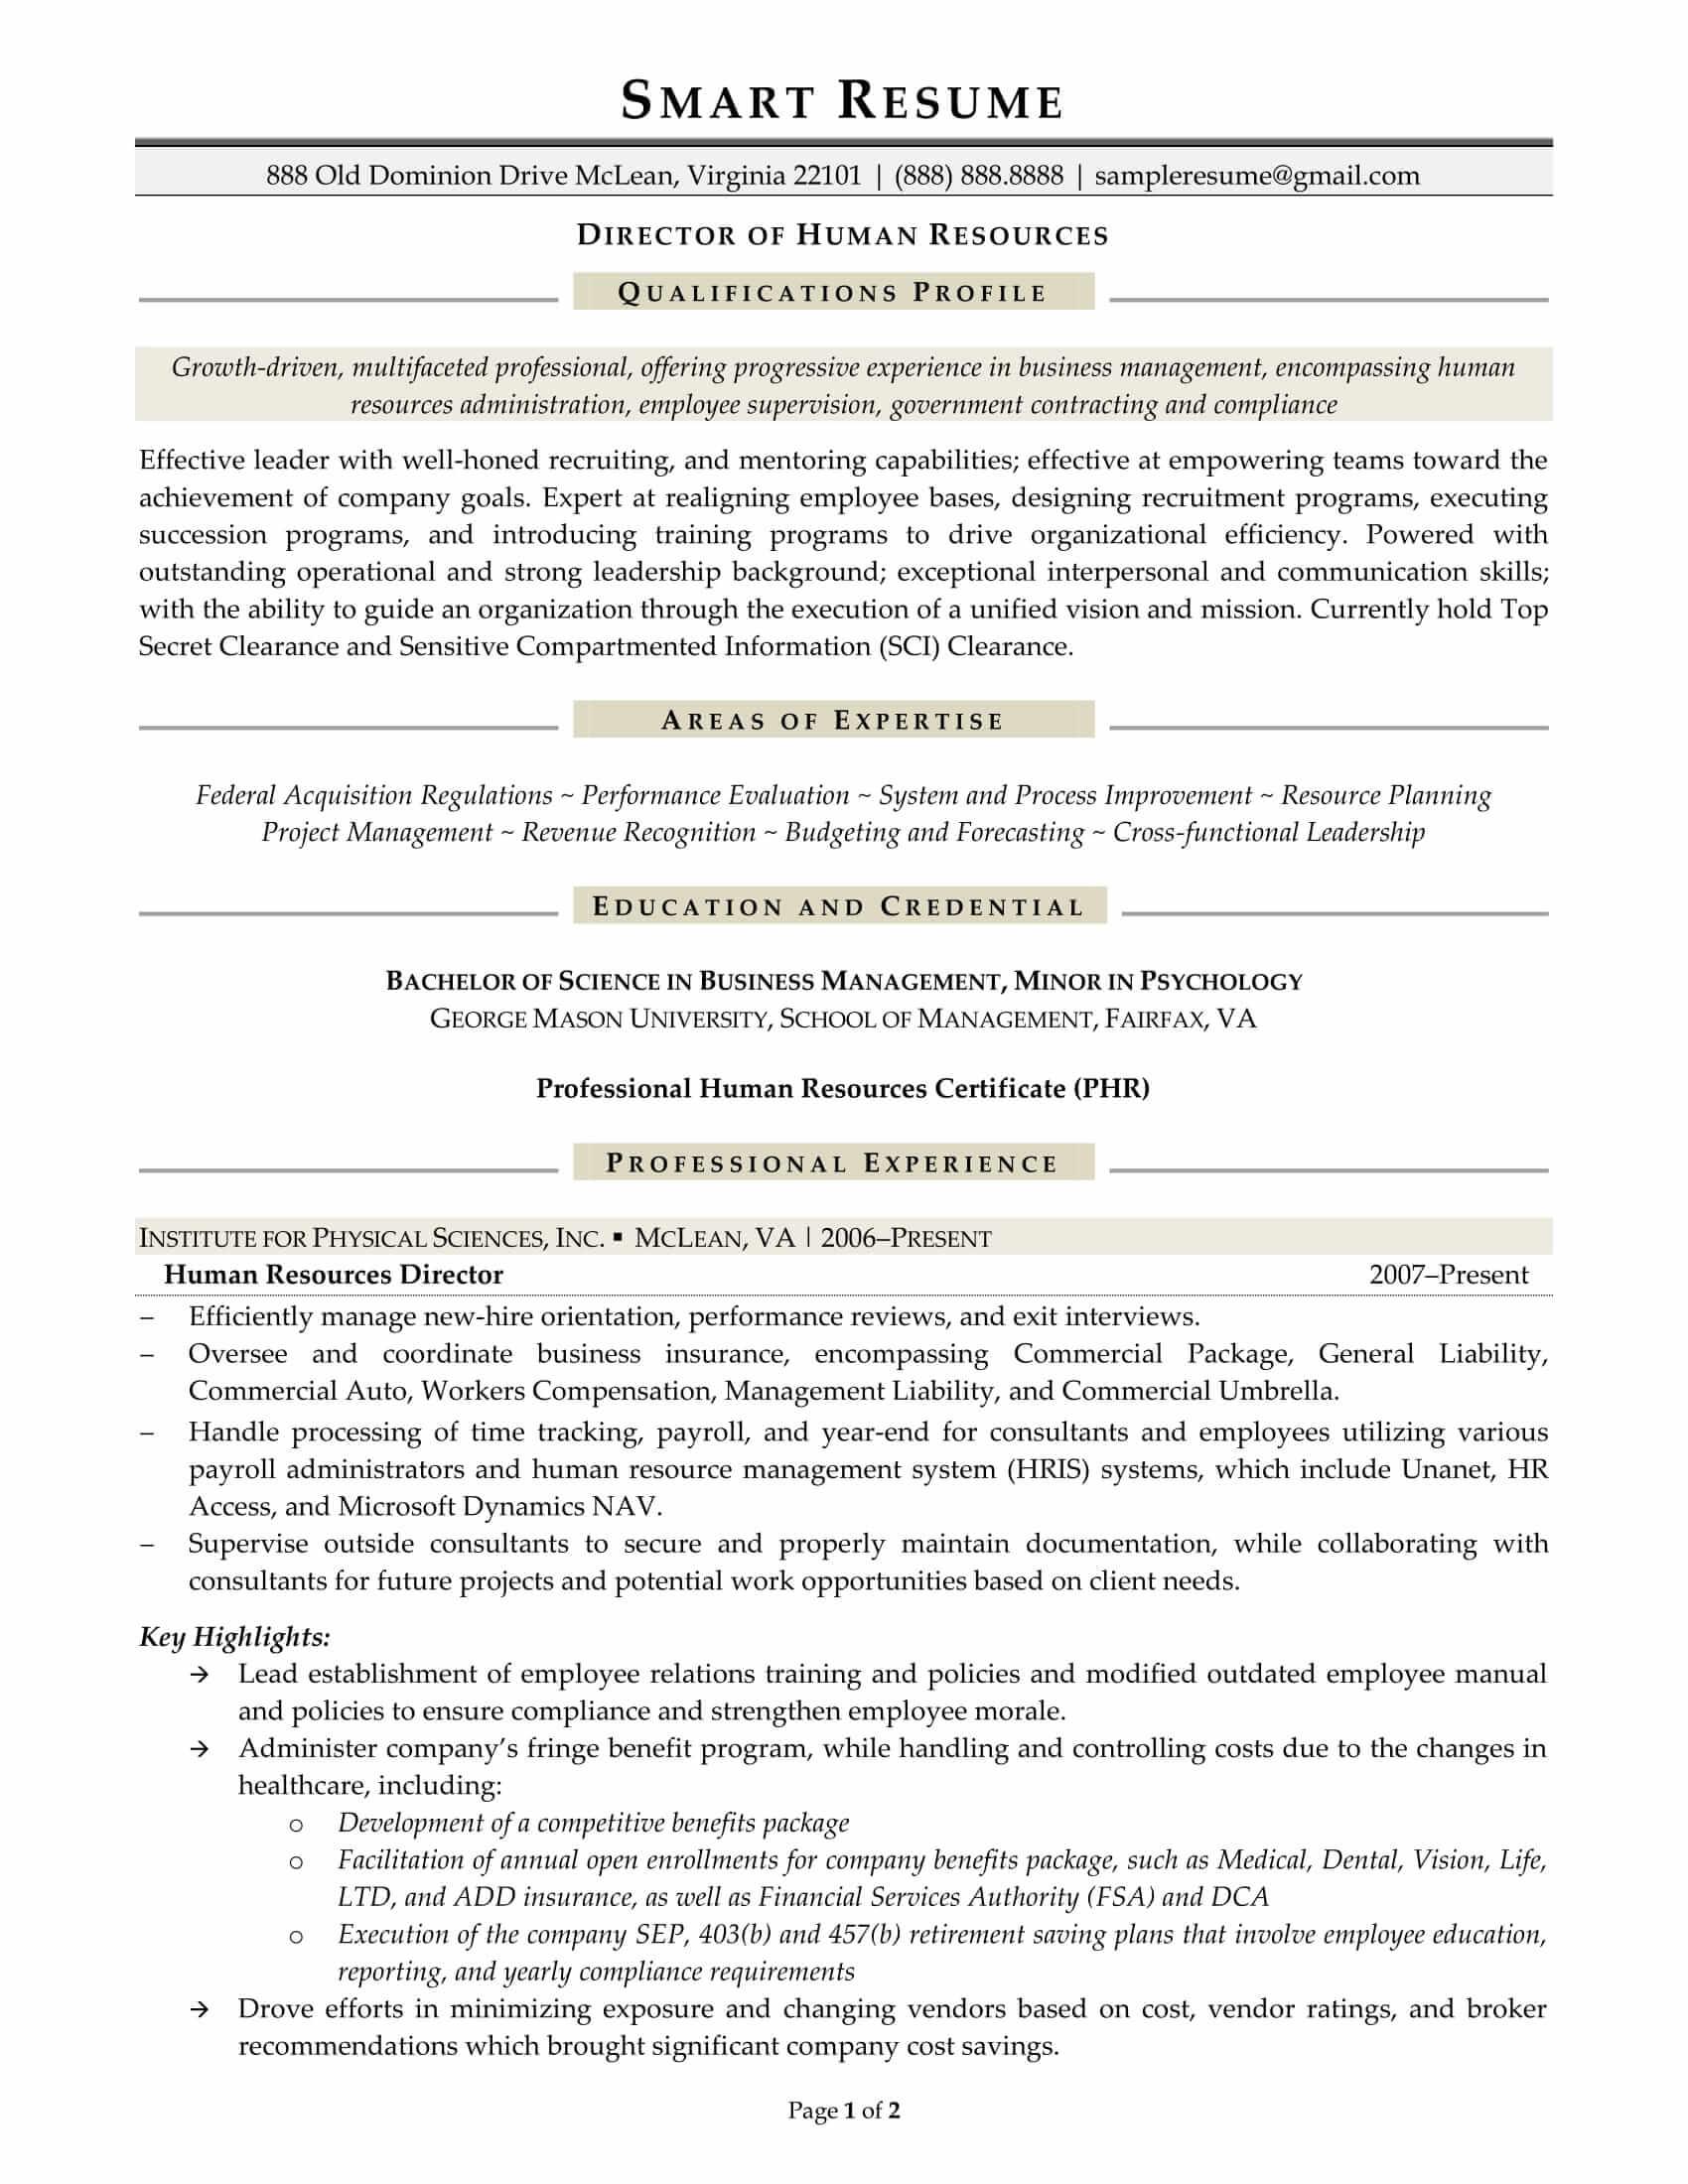 ... Hr Coordinator Resume Example Sample Uksta Adtddns Asia Home Design  Home Interior And Design Ideas Sample Resume For Human Resources Manager  Resume Cv ...